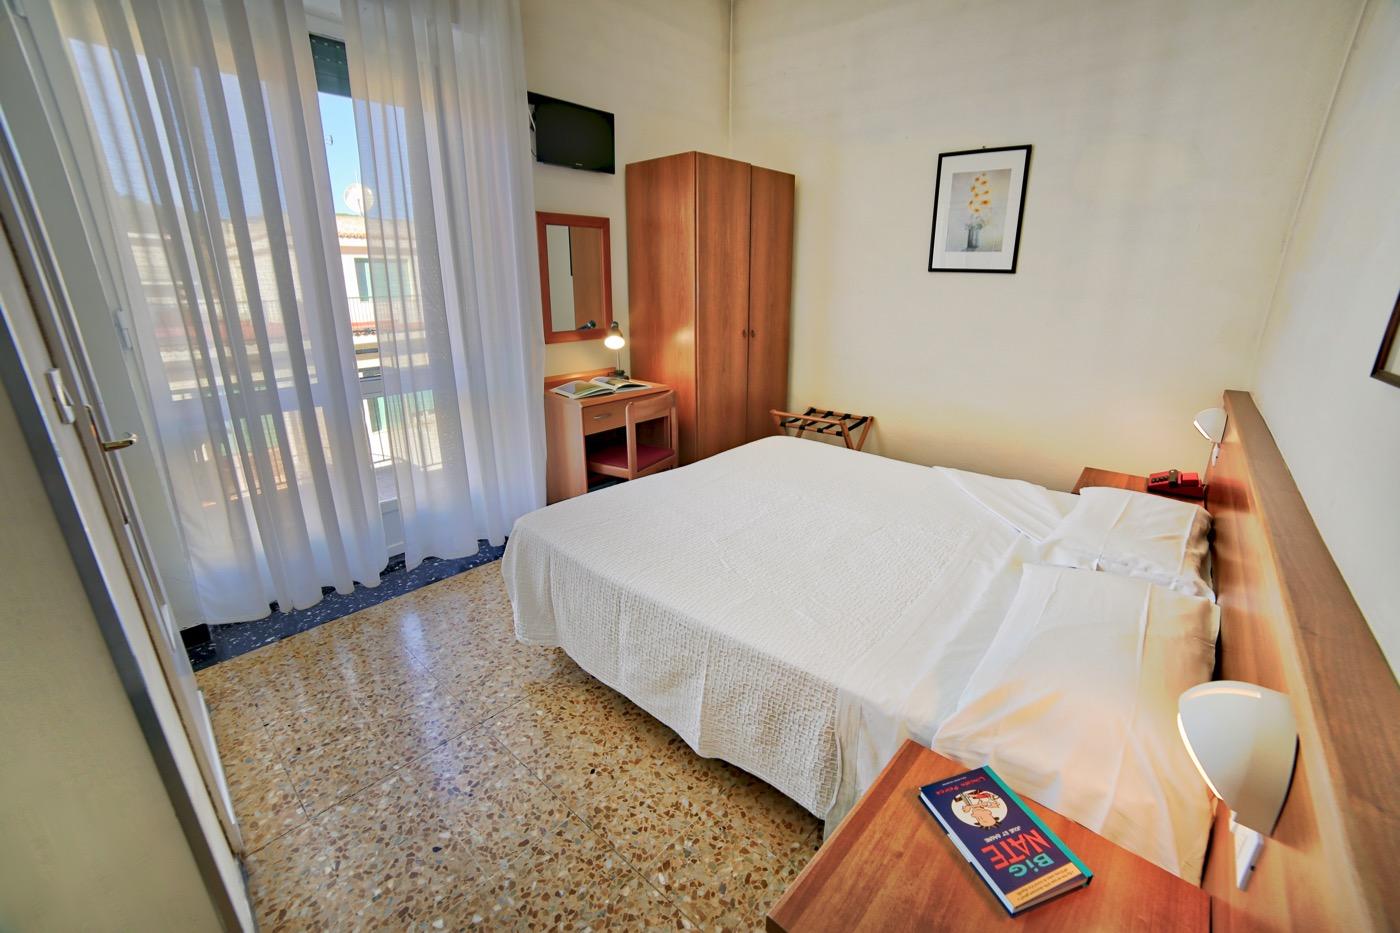 Hotel Mayola camera standard